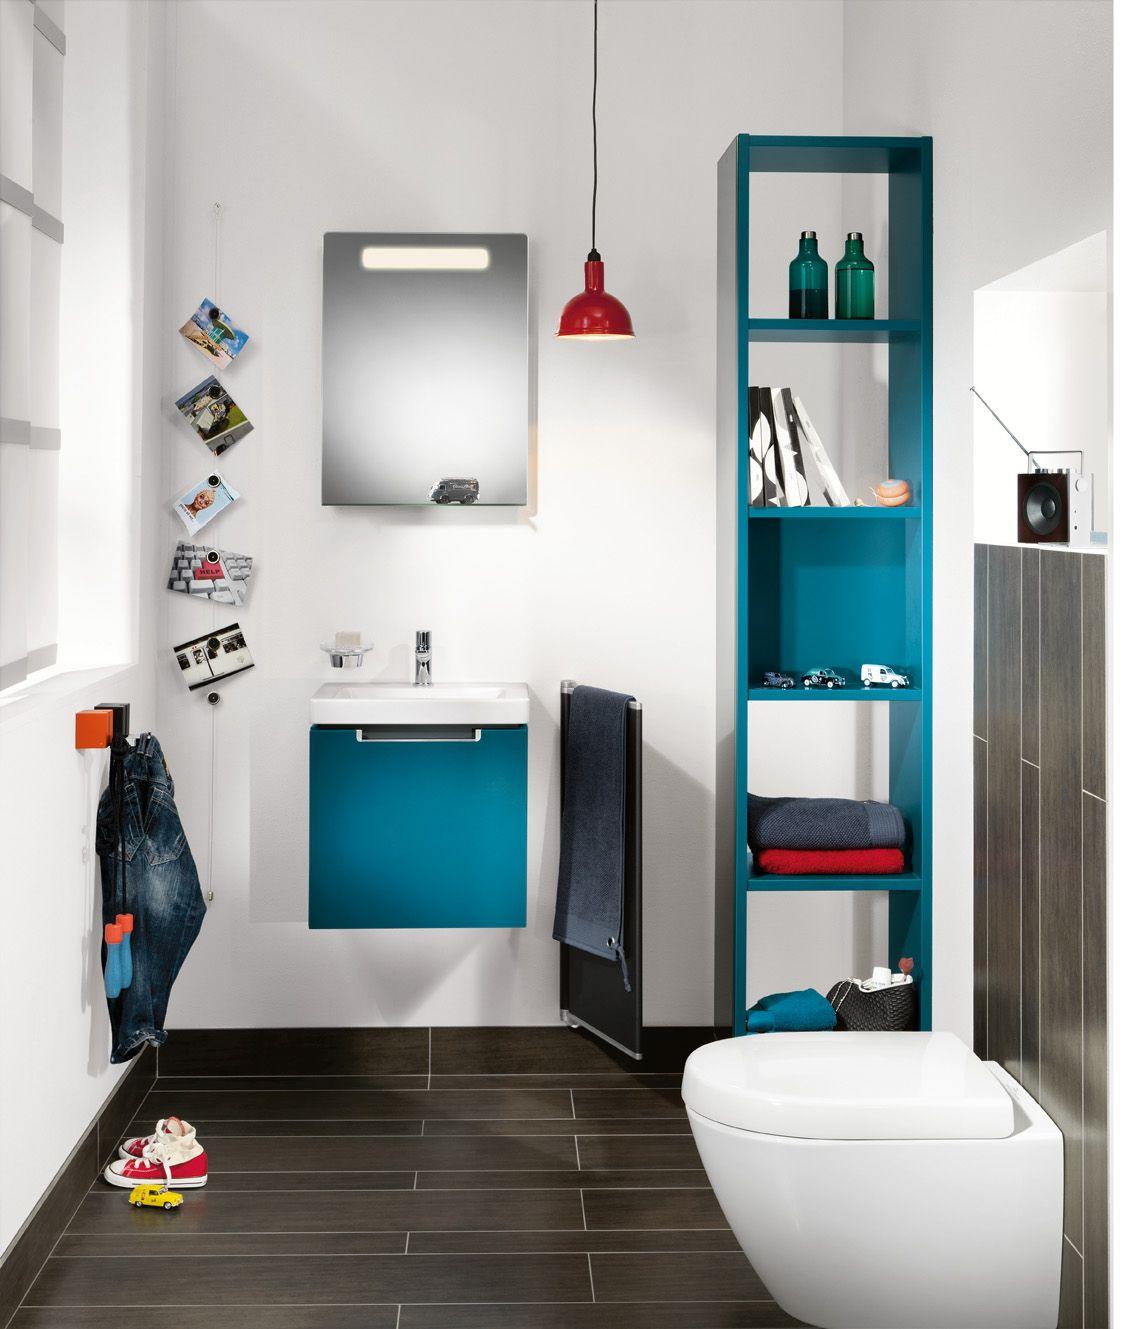 Санфаянс Villeroy&Boch: Subway #hogart_art #interiordesign #design #apartment #house #bathroom #furniture #VilleroyBoch #shower #sink #bathroomfurniture #bath #mirror